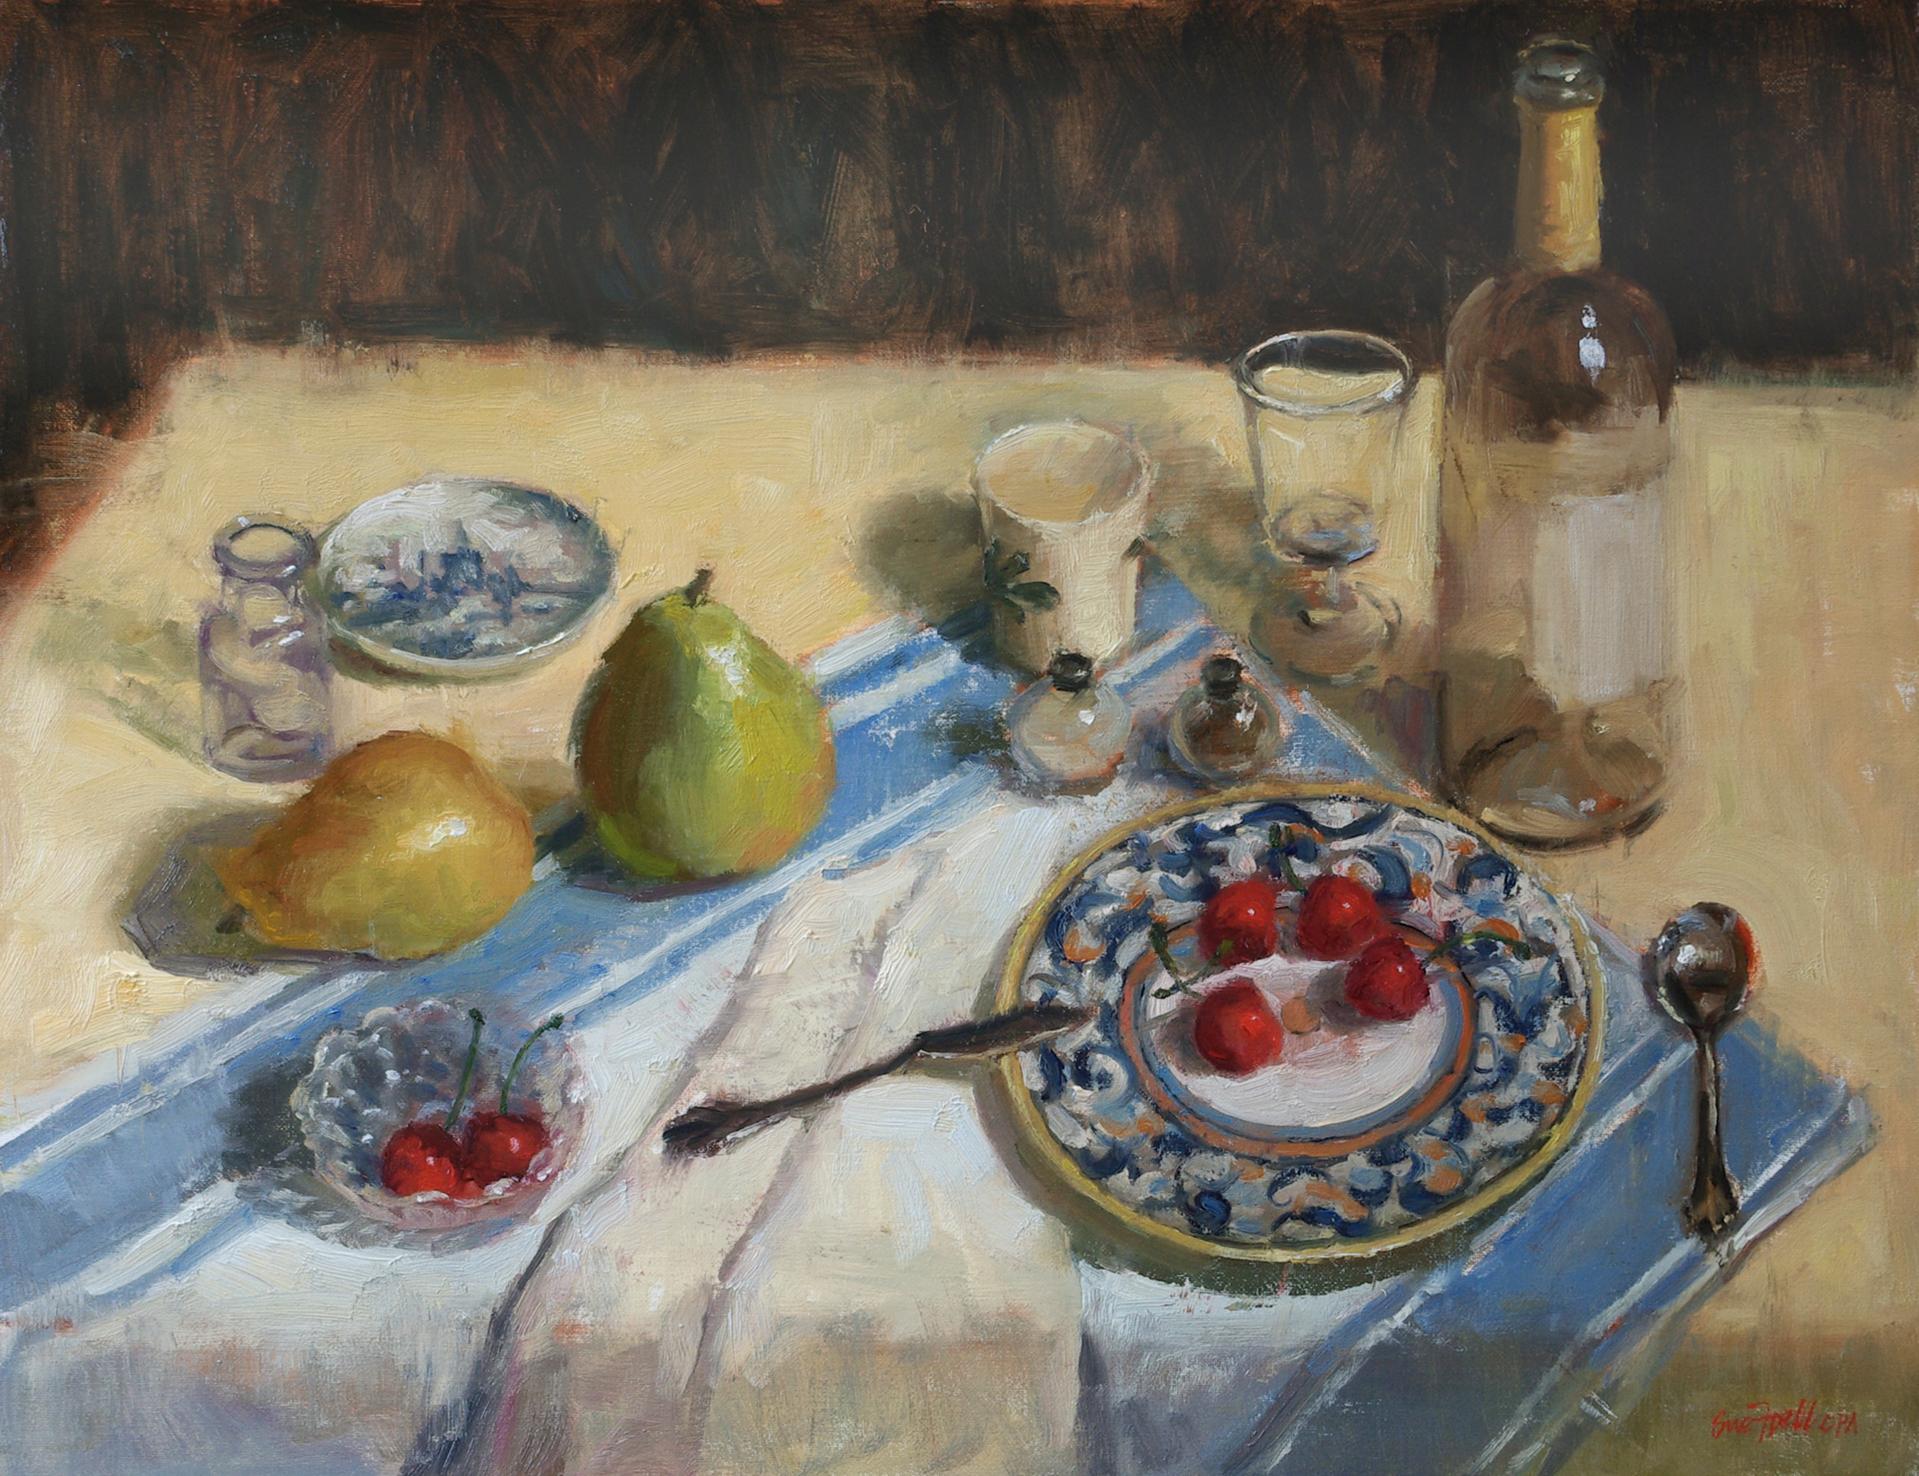 Table Arrangement by Sue Foell, opa